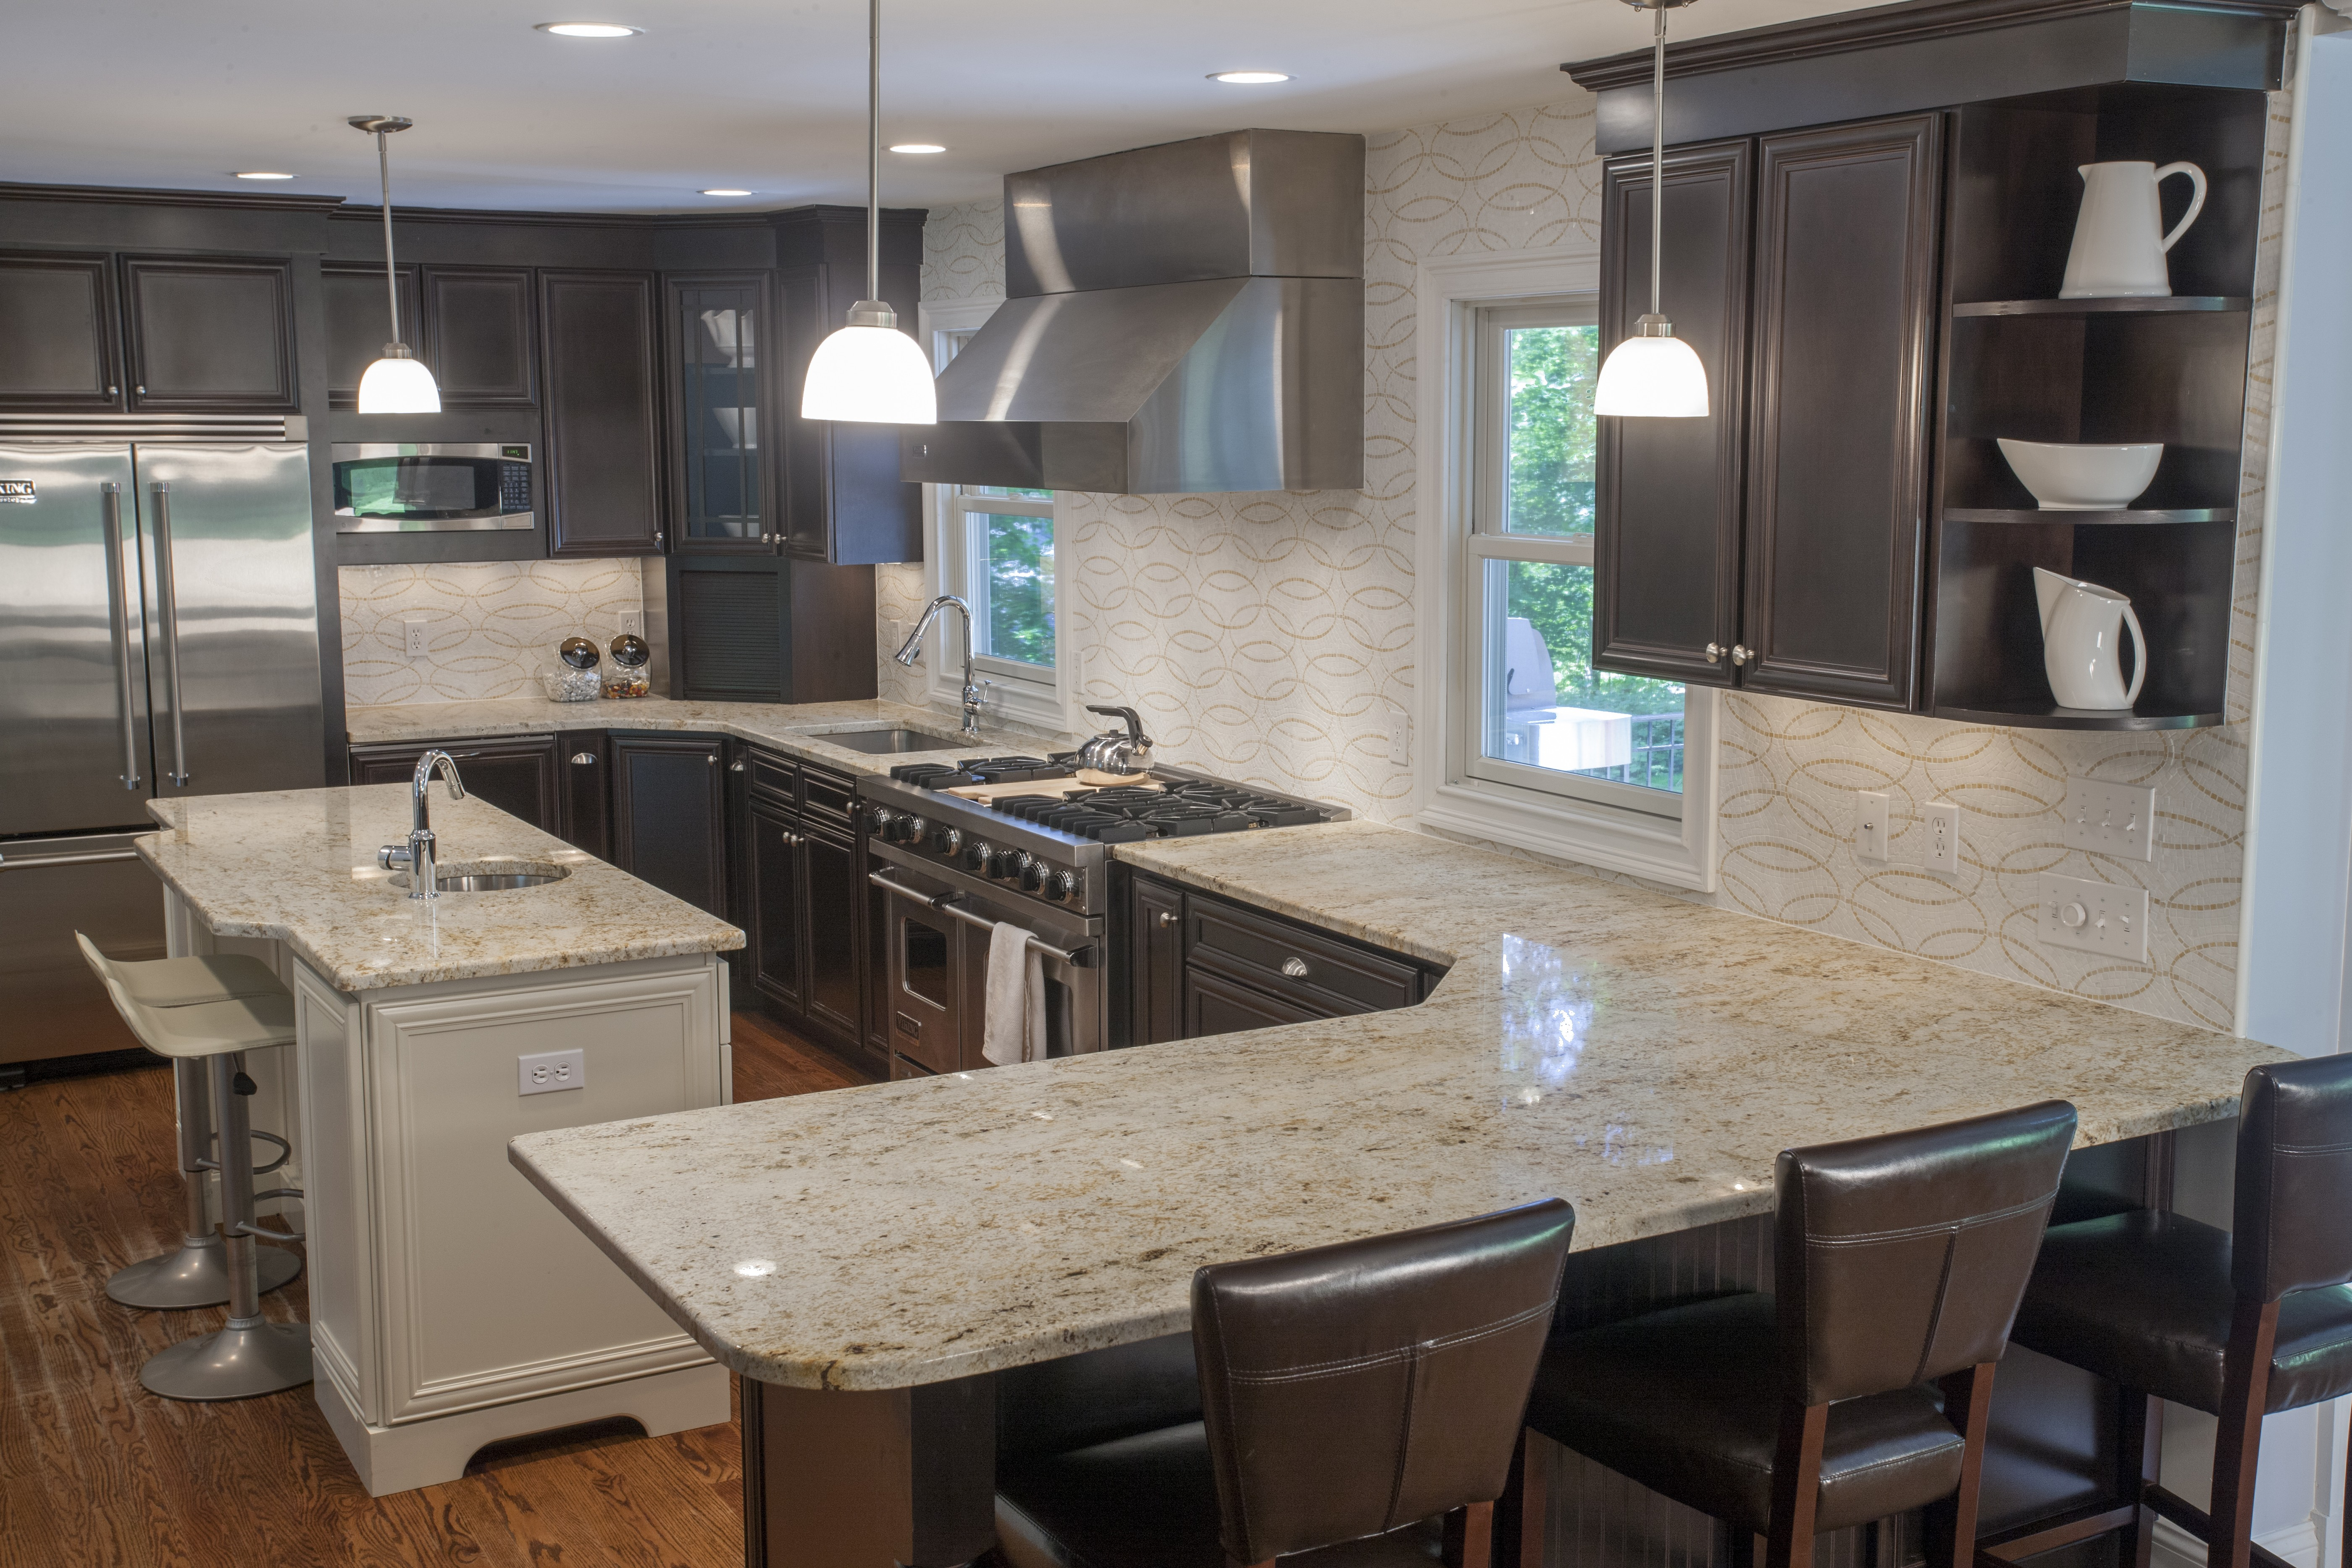 granite-kitchen-countertop-options-about2.jpg